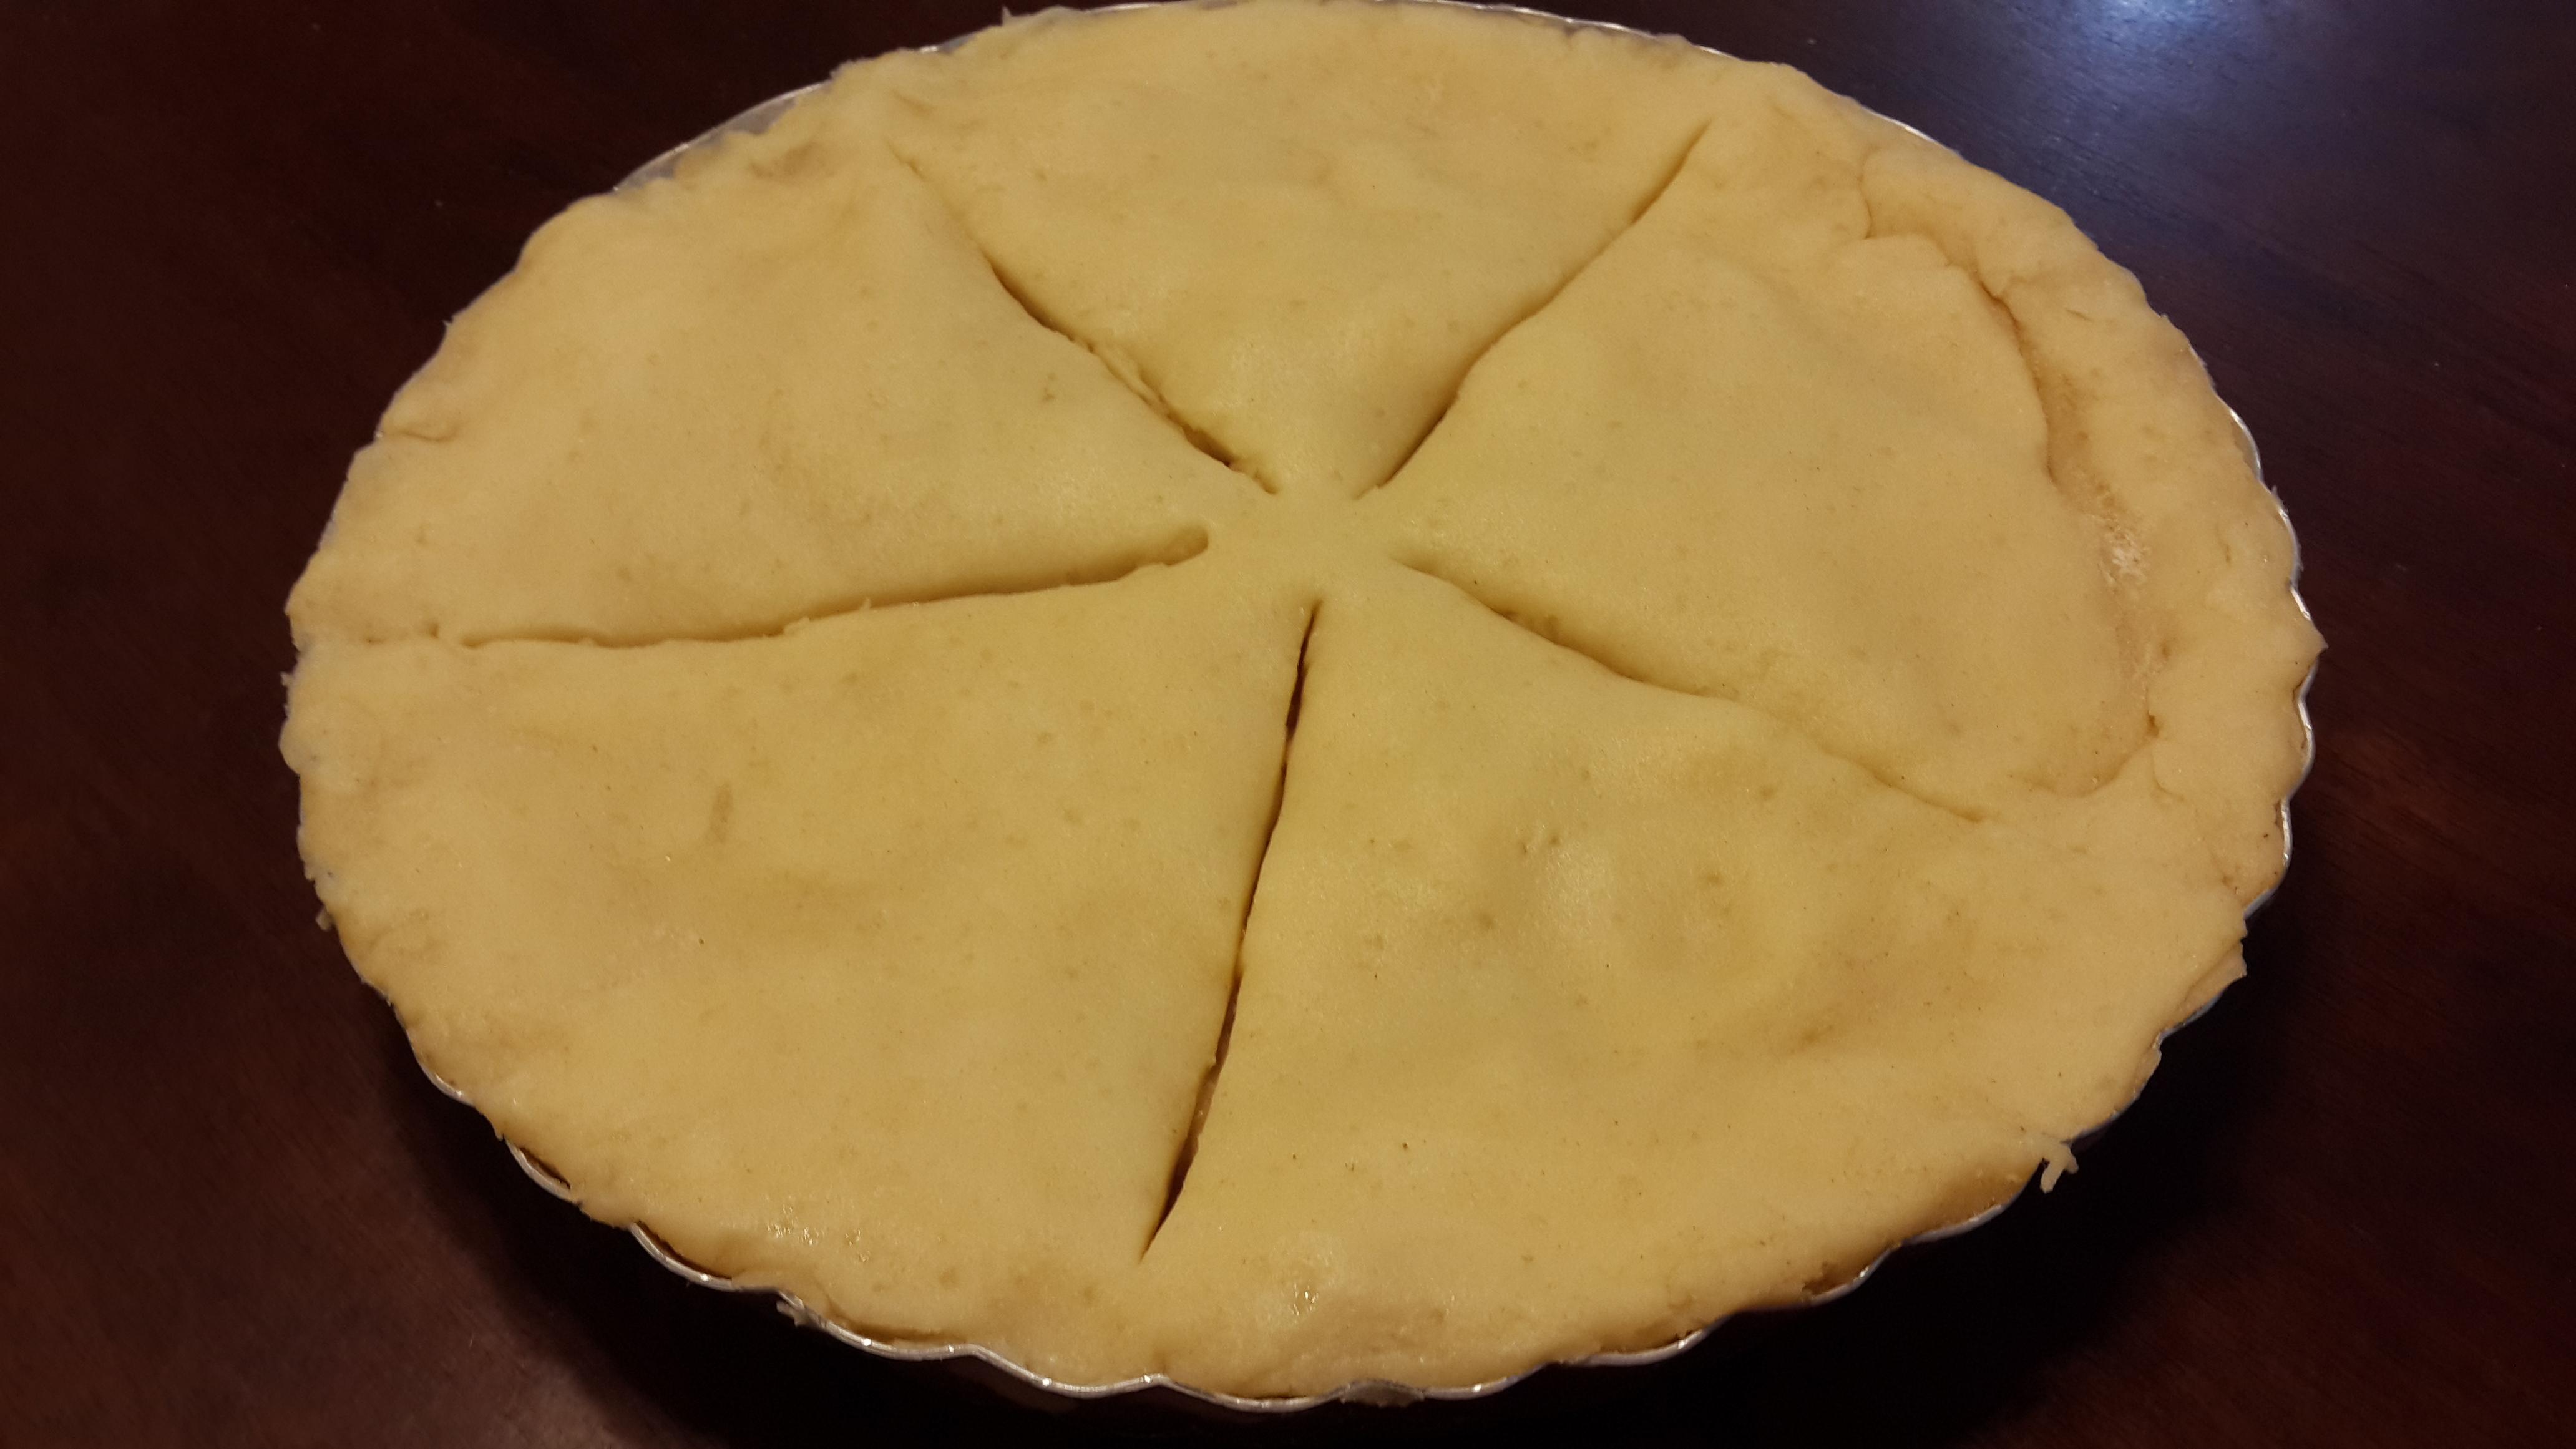 Pre-baked Apple Pie